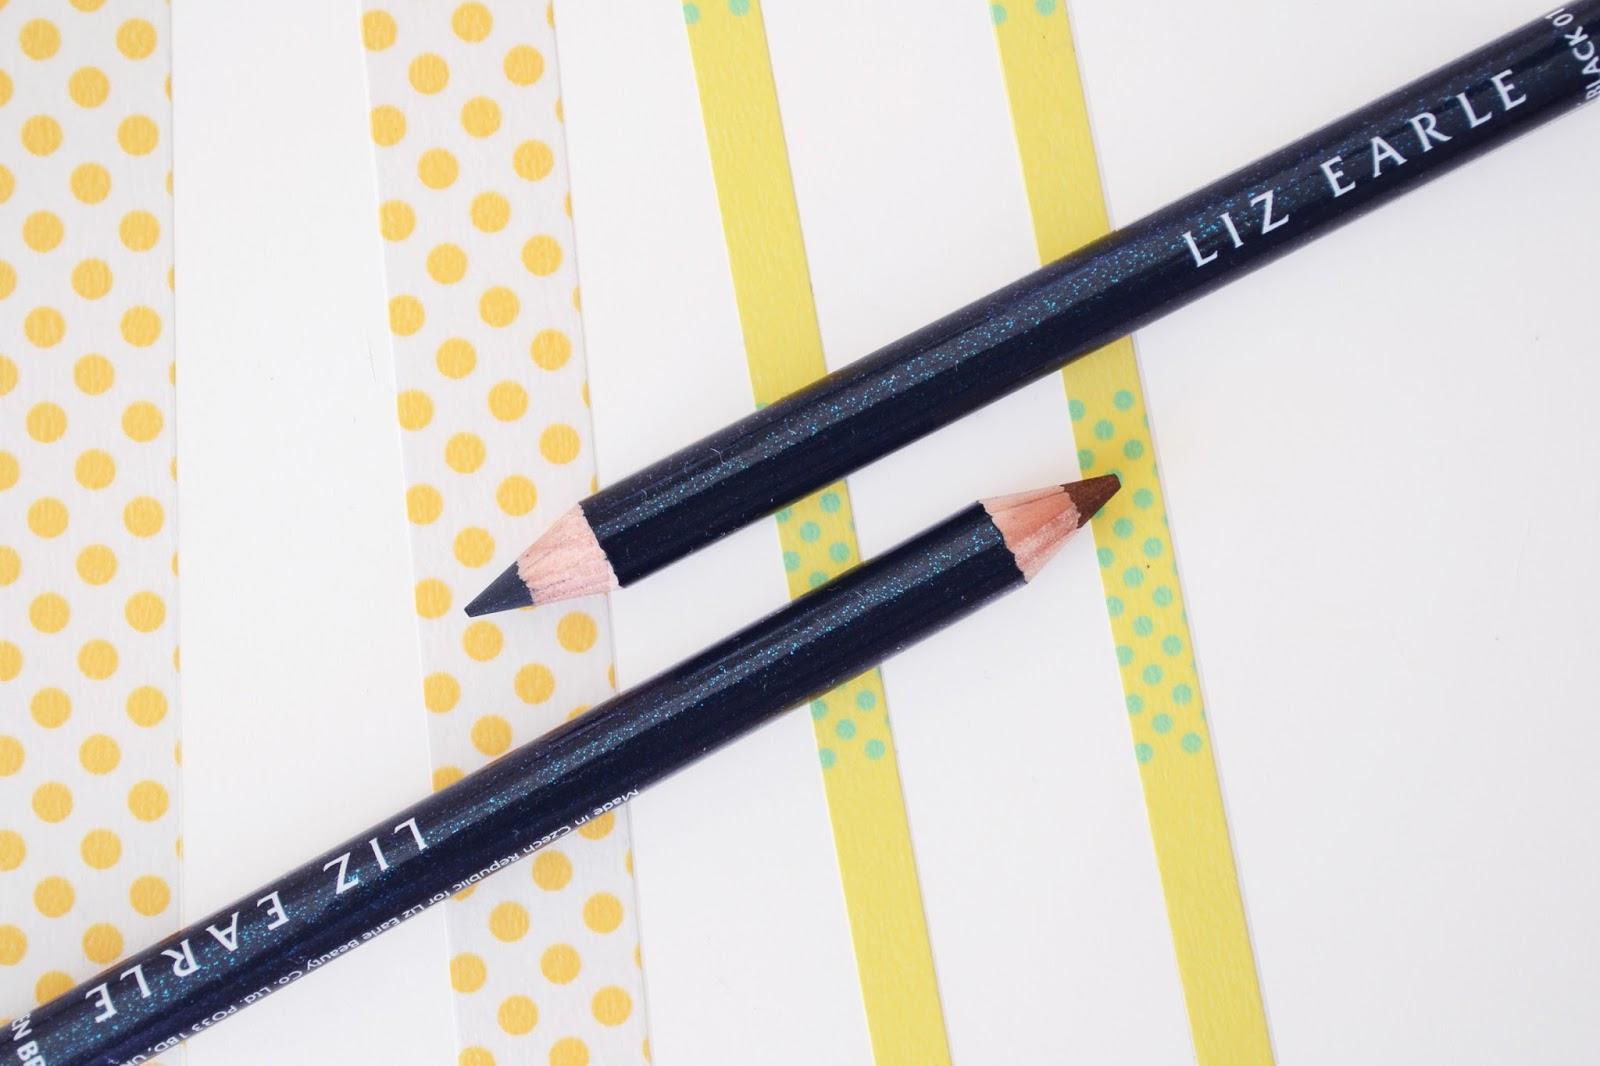 liz earle eyeliner pencils